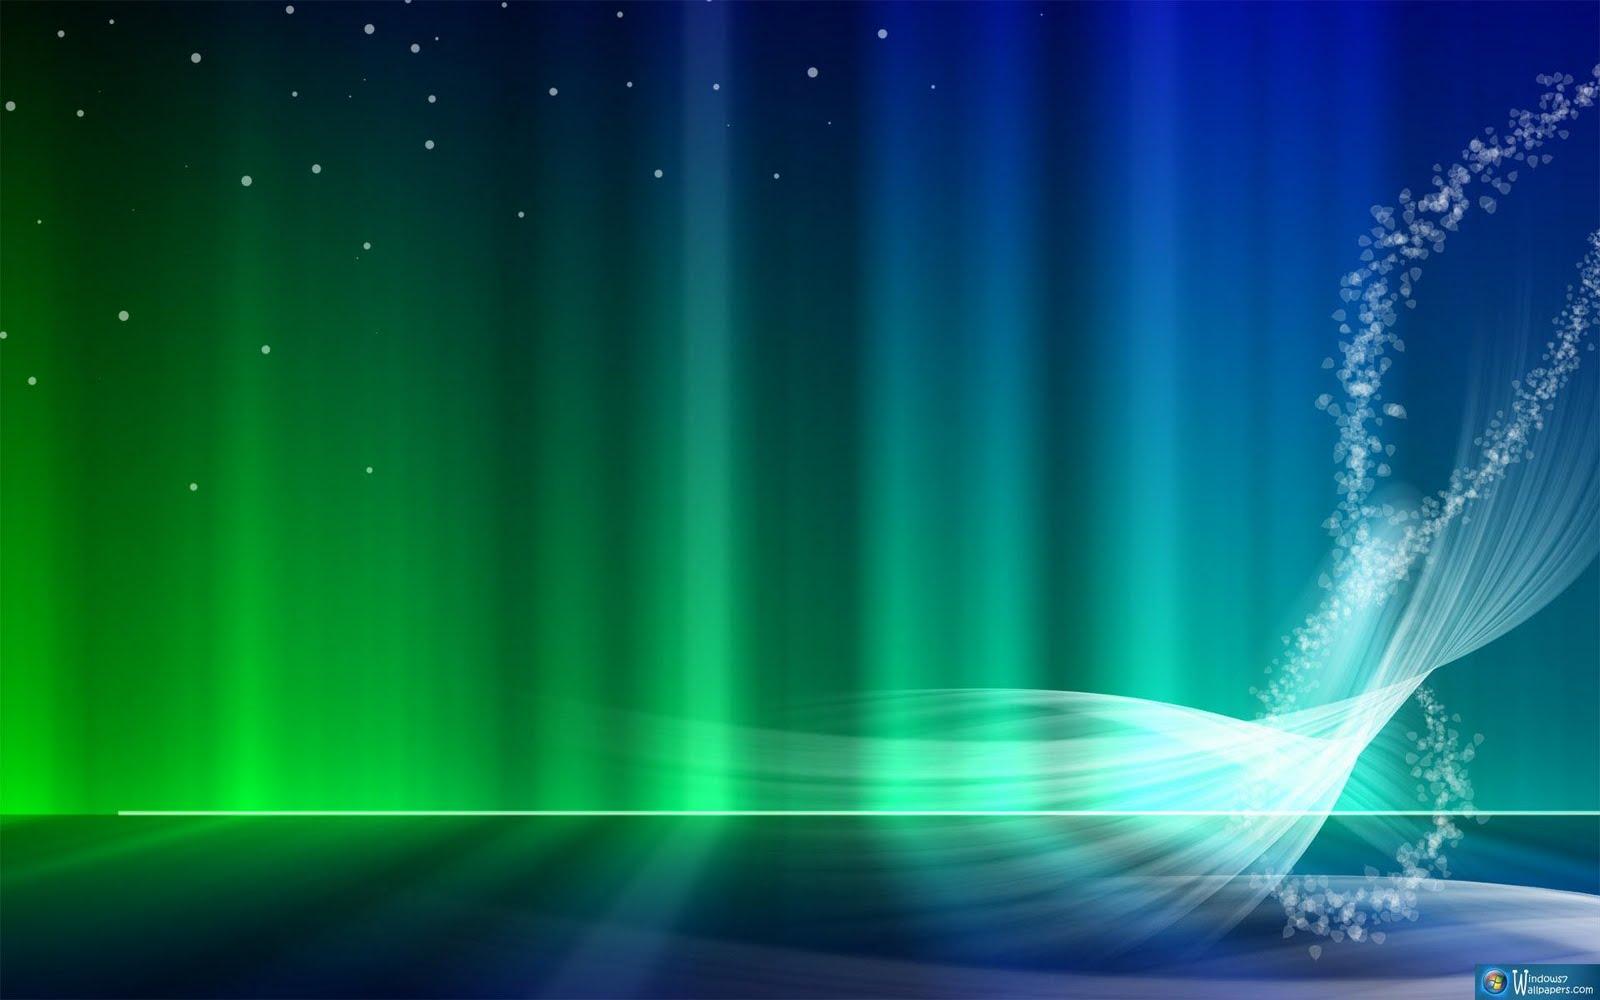 http://3.bp.blogspot.com/-yaFGhJaWG2k/TiRKcmgVLmI/AAAAAAAACso/JG-bXTKYyLw/s1600/window+7+wallpaper+hd2.jpg